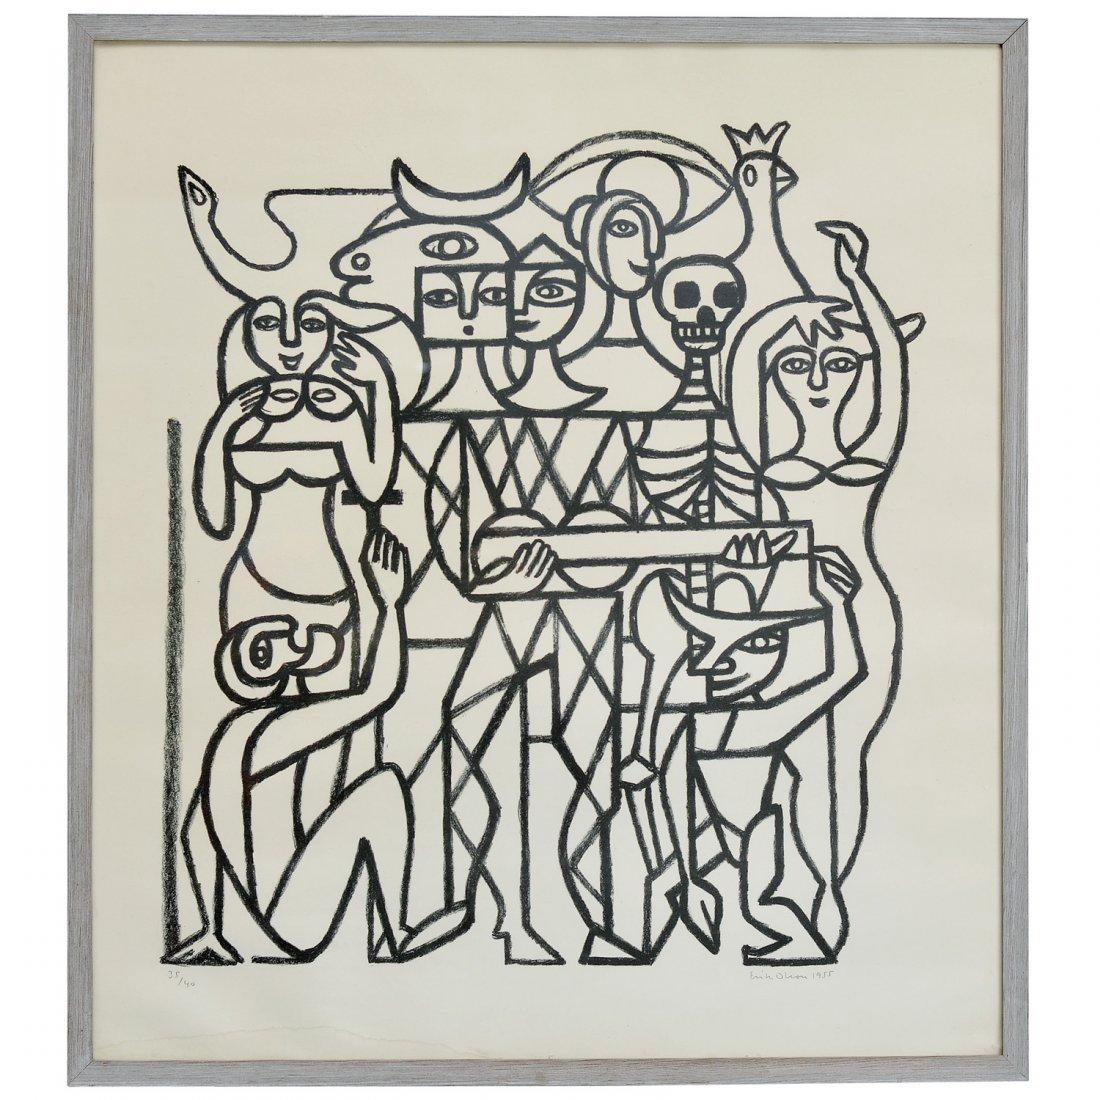 65: ERIK OLSON (1901-1986), litografi